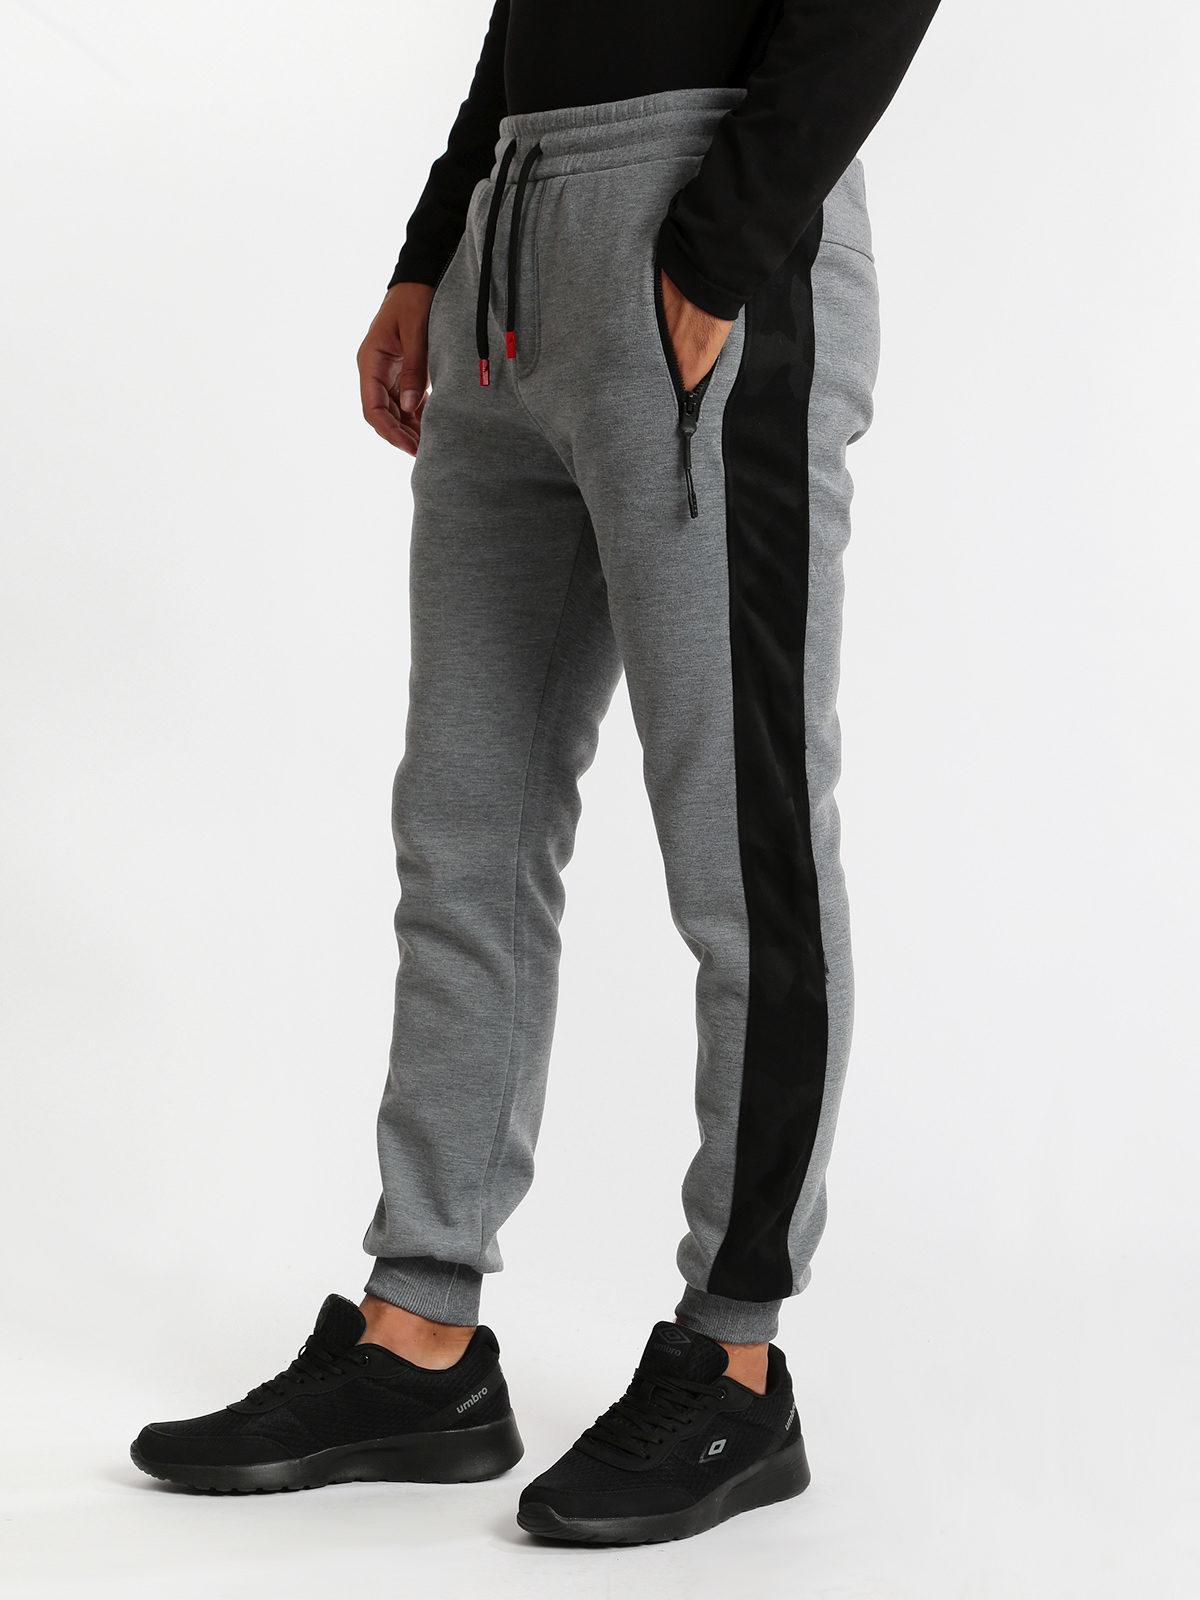 Pantaloni sportivi con polsini flex style | MecShopping